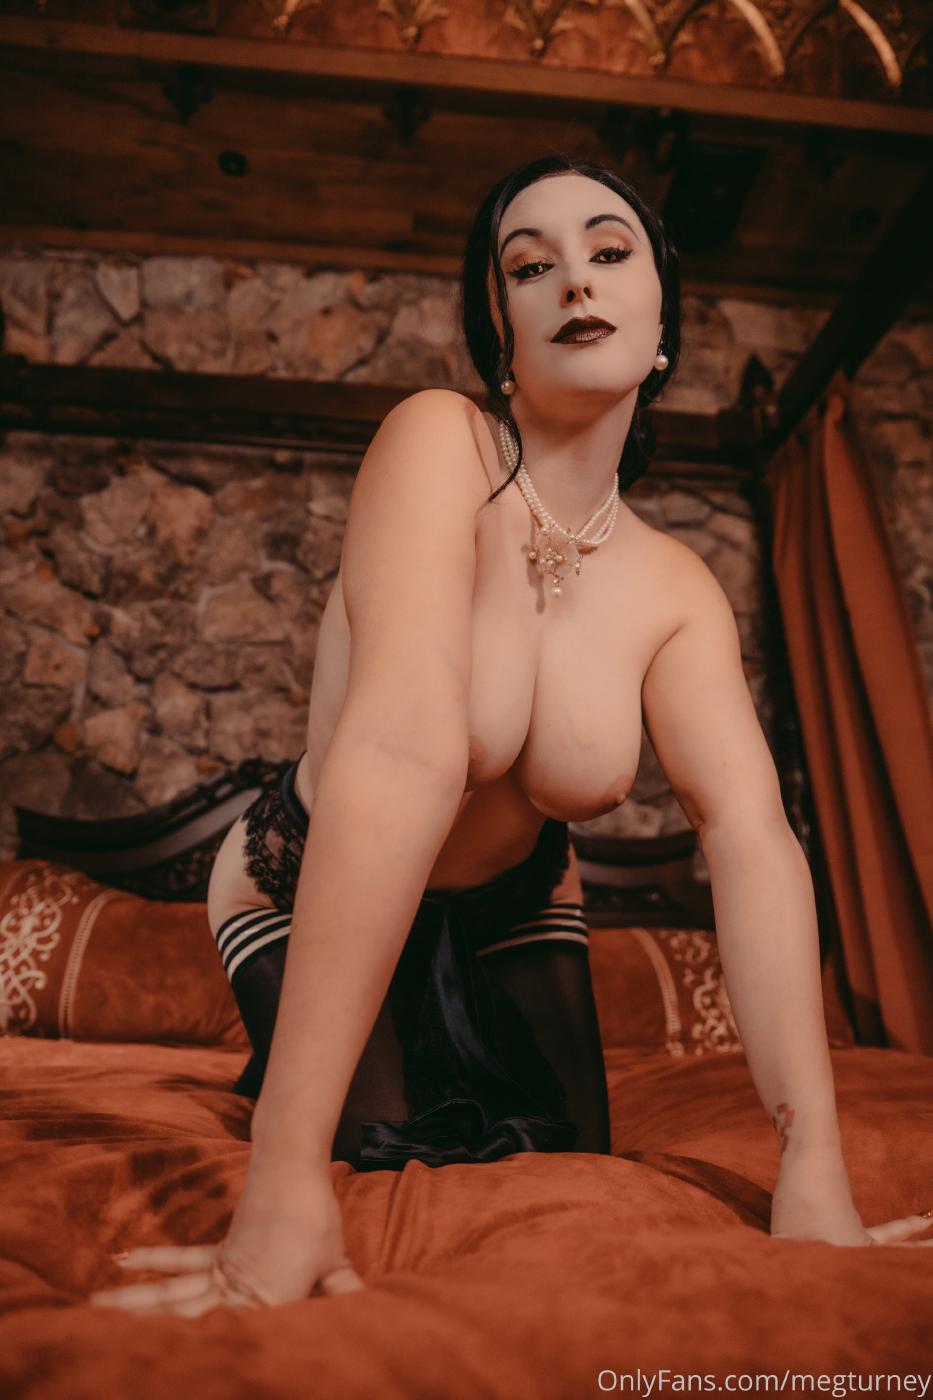 Meg Turney Lady Dimitrescu Cosplay Onlyfans Set Leaked 0037